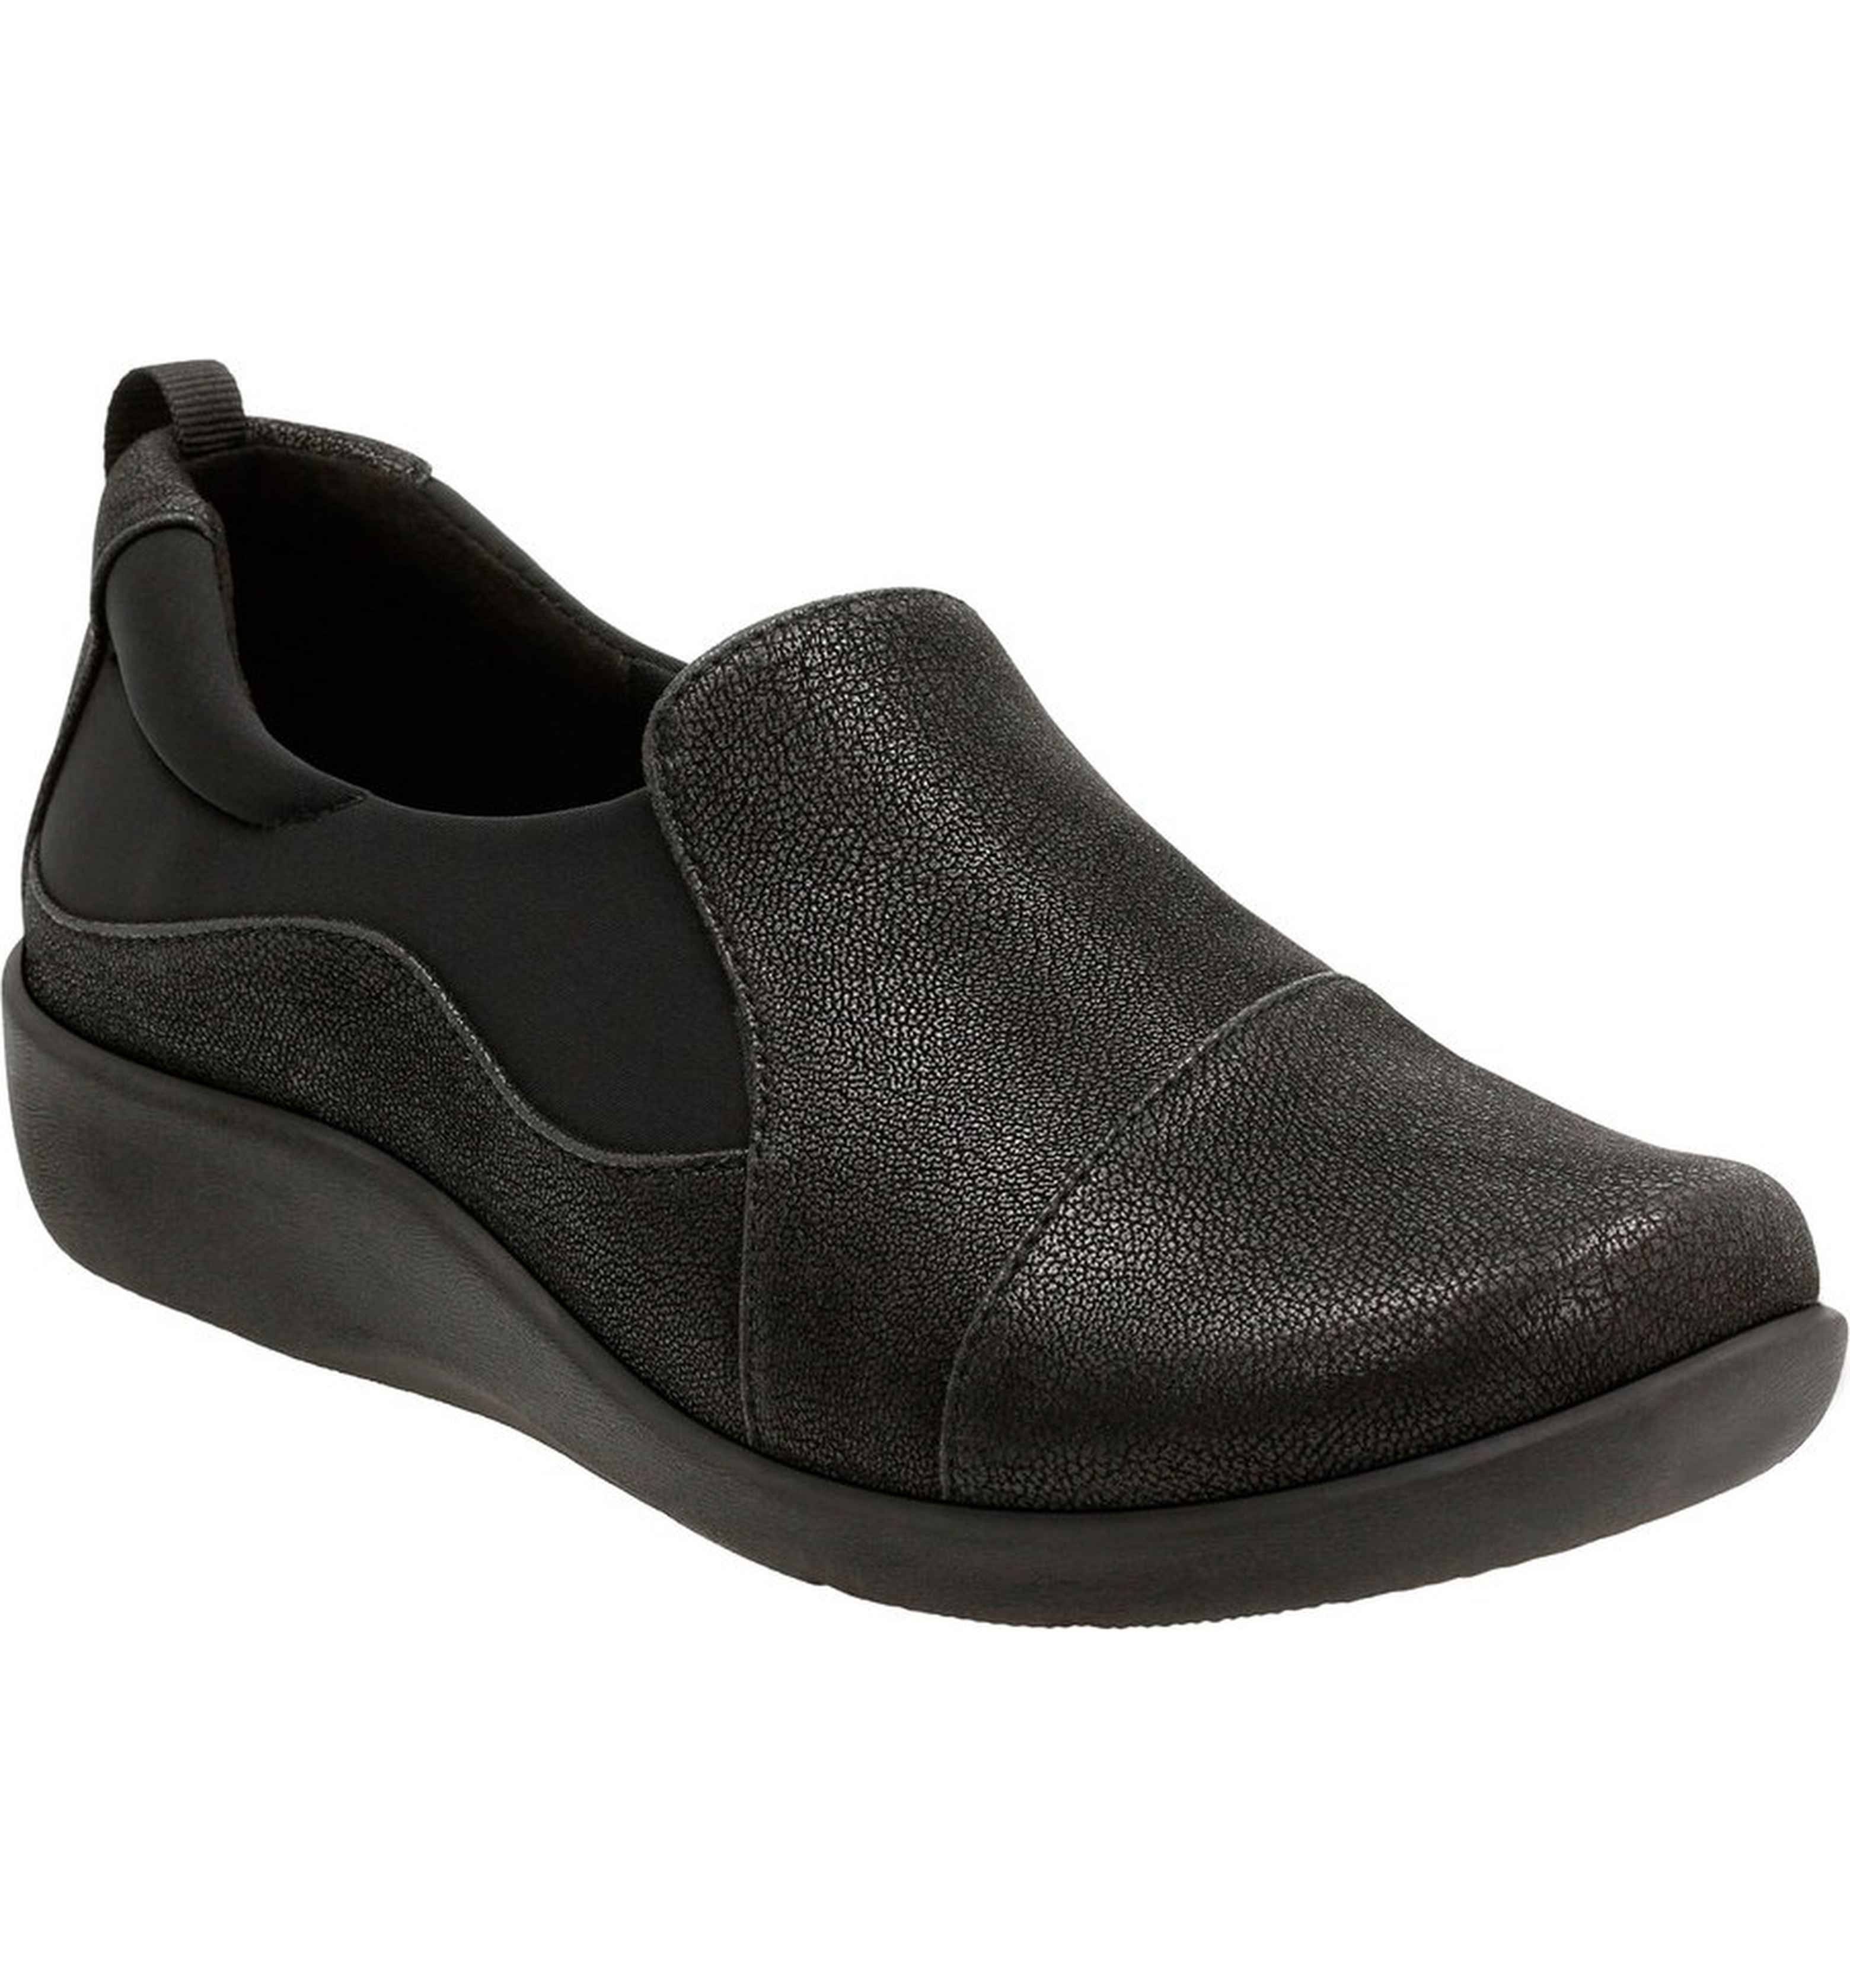 'Sillian Paz' Slip-On Sneaker